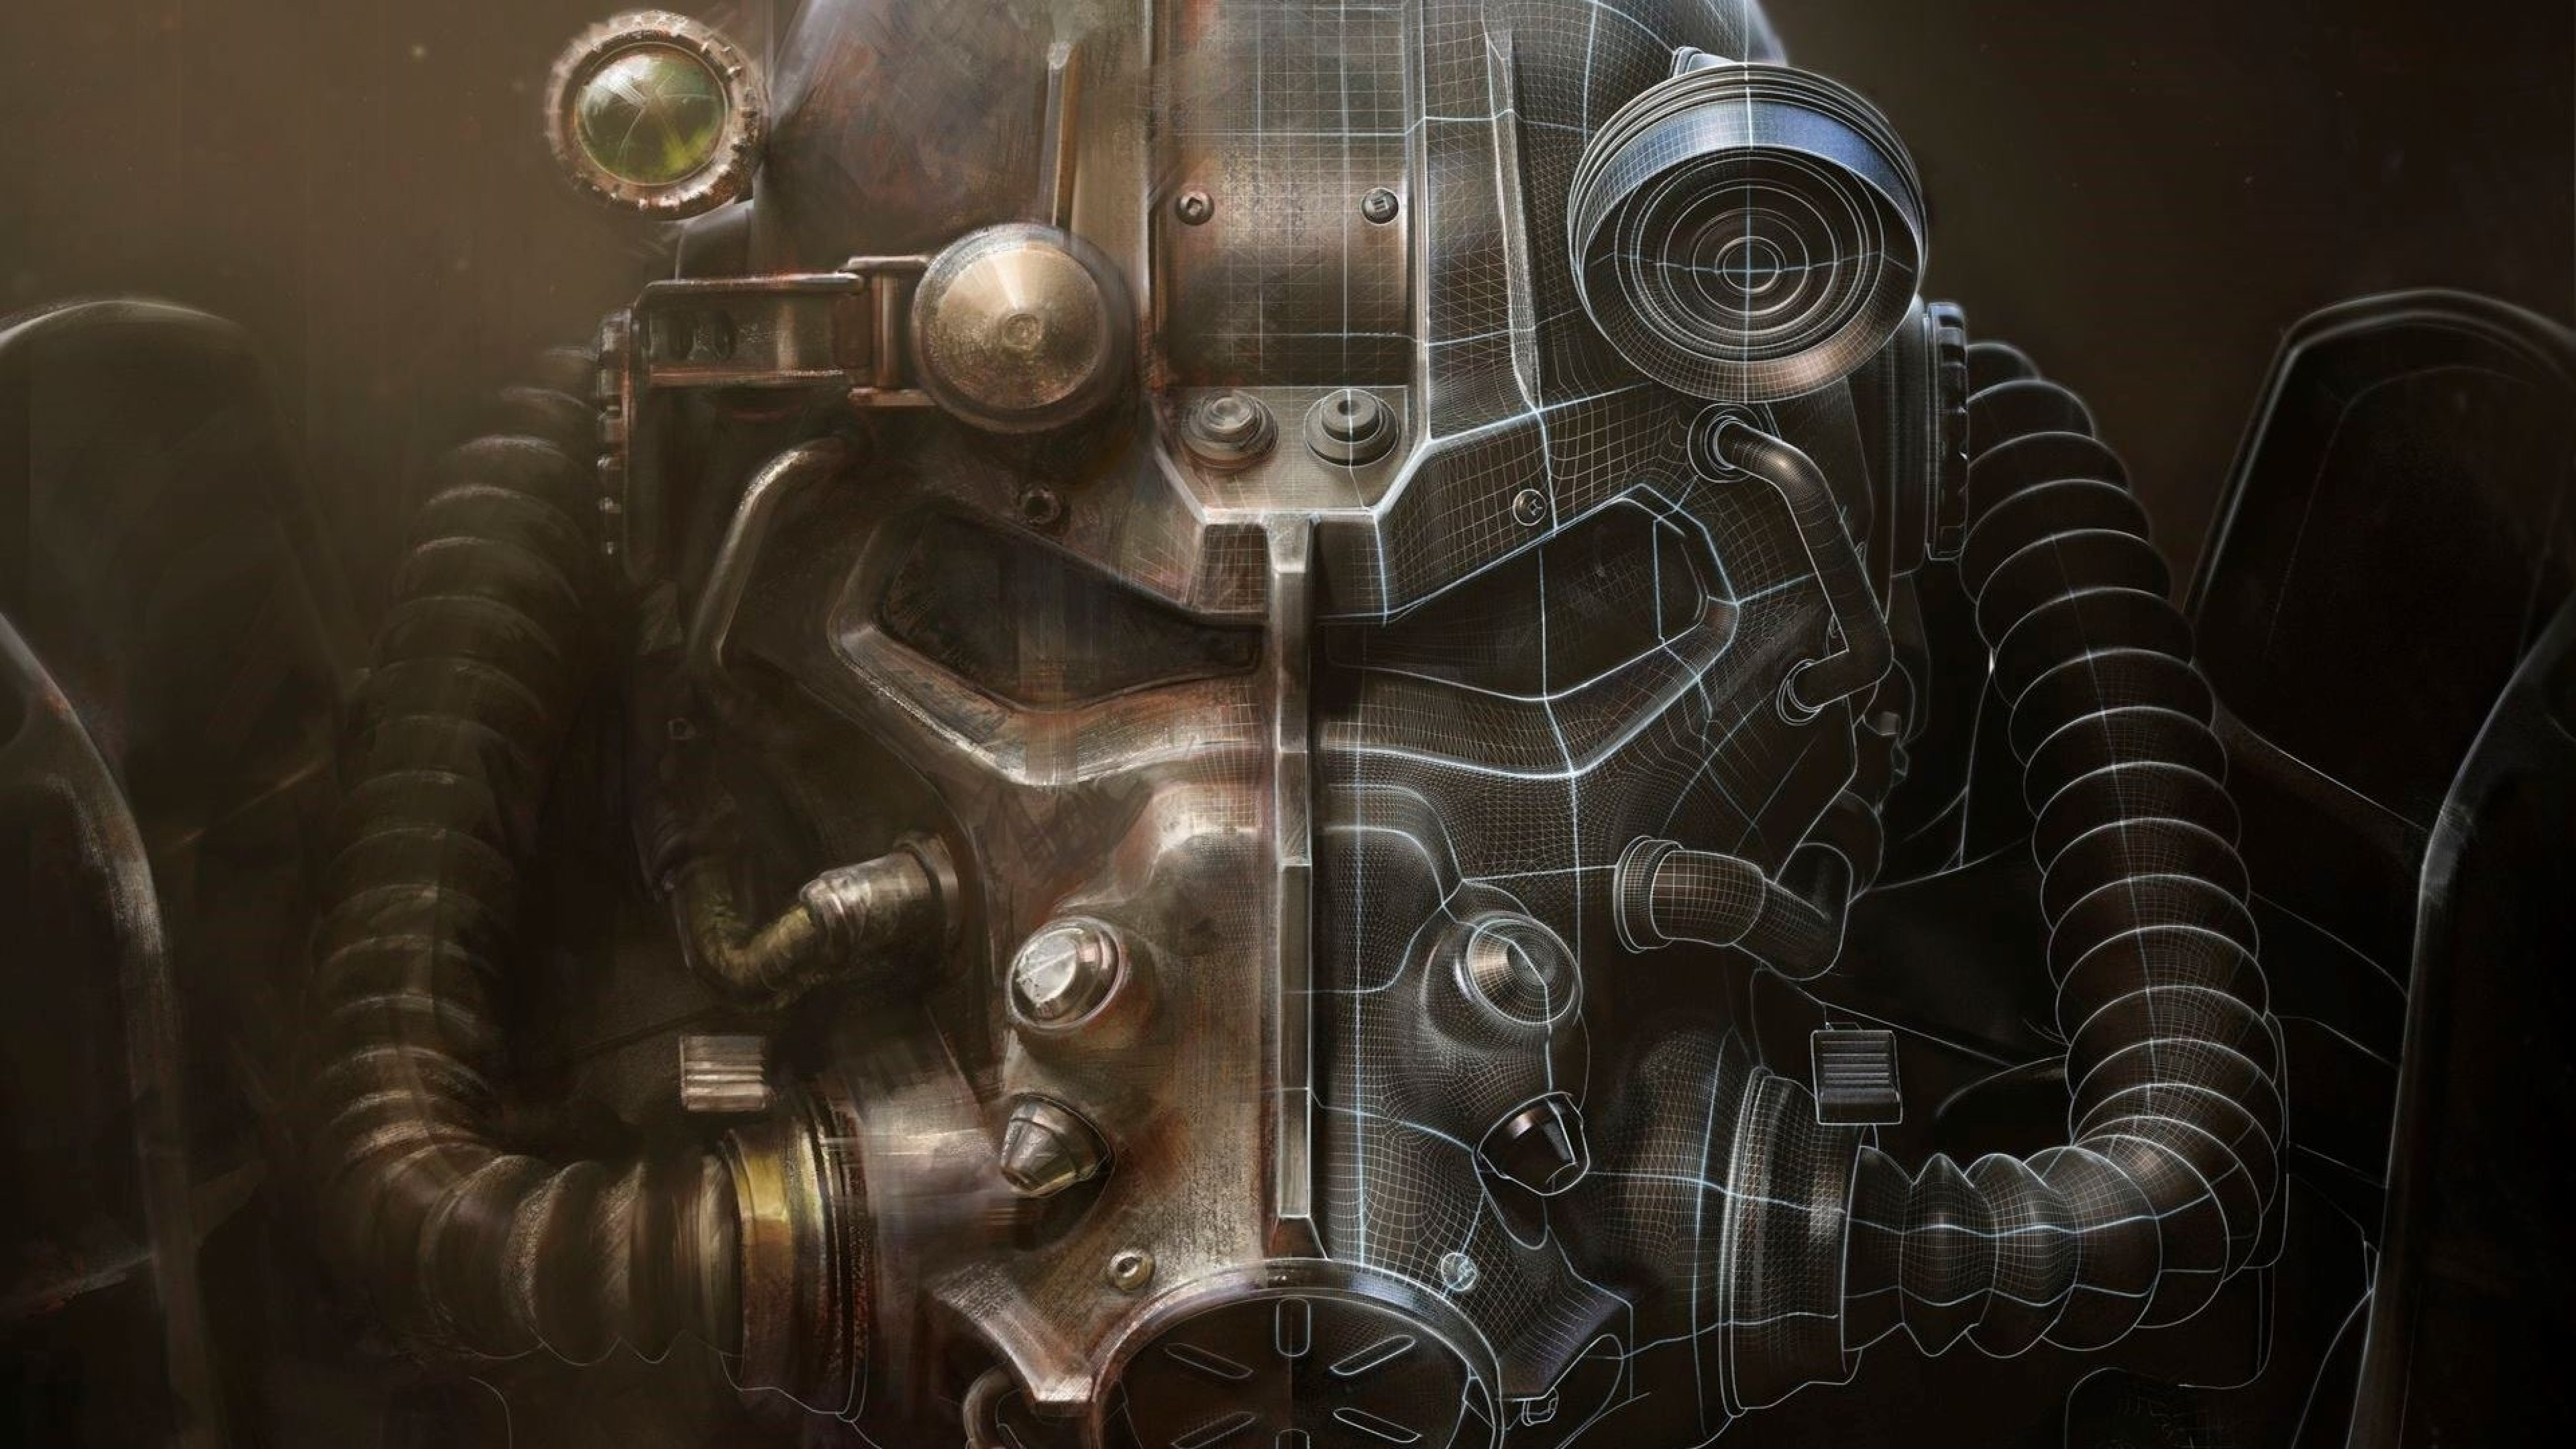 Fallout 4 Juggernaut Face Free Wallpaper For Desktop And Mobiles 4k